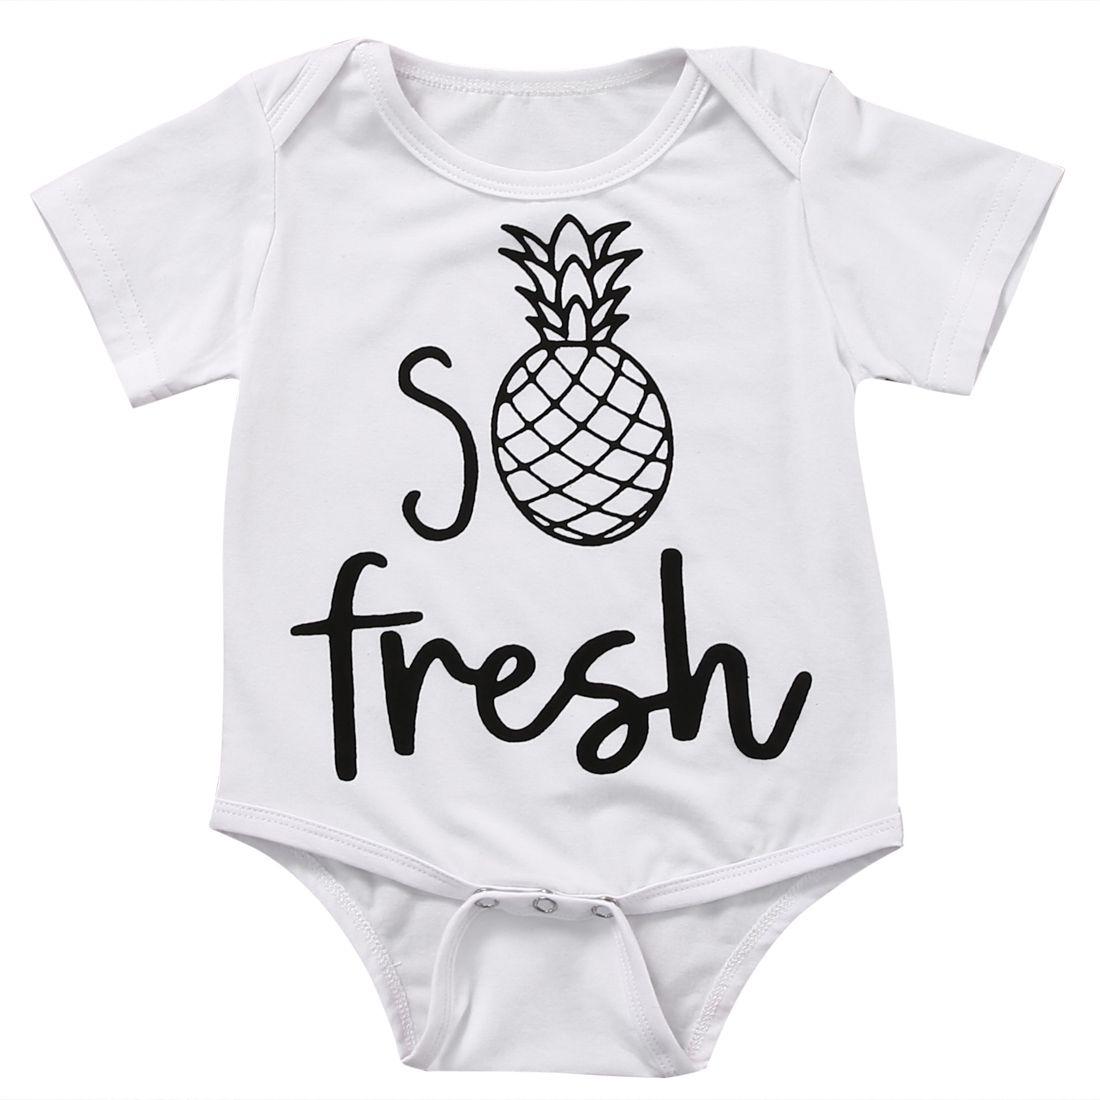 Bayi Baru Lahir Bayi Laki Laki Perempuan Anak Anak Katun Nanas